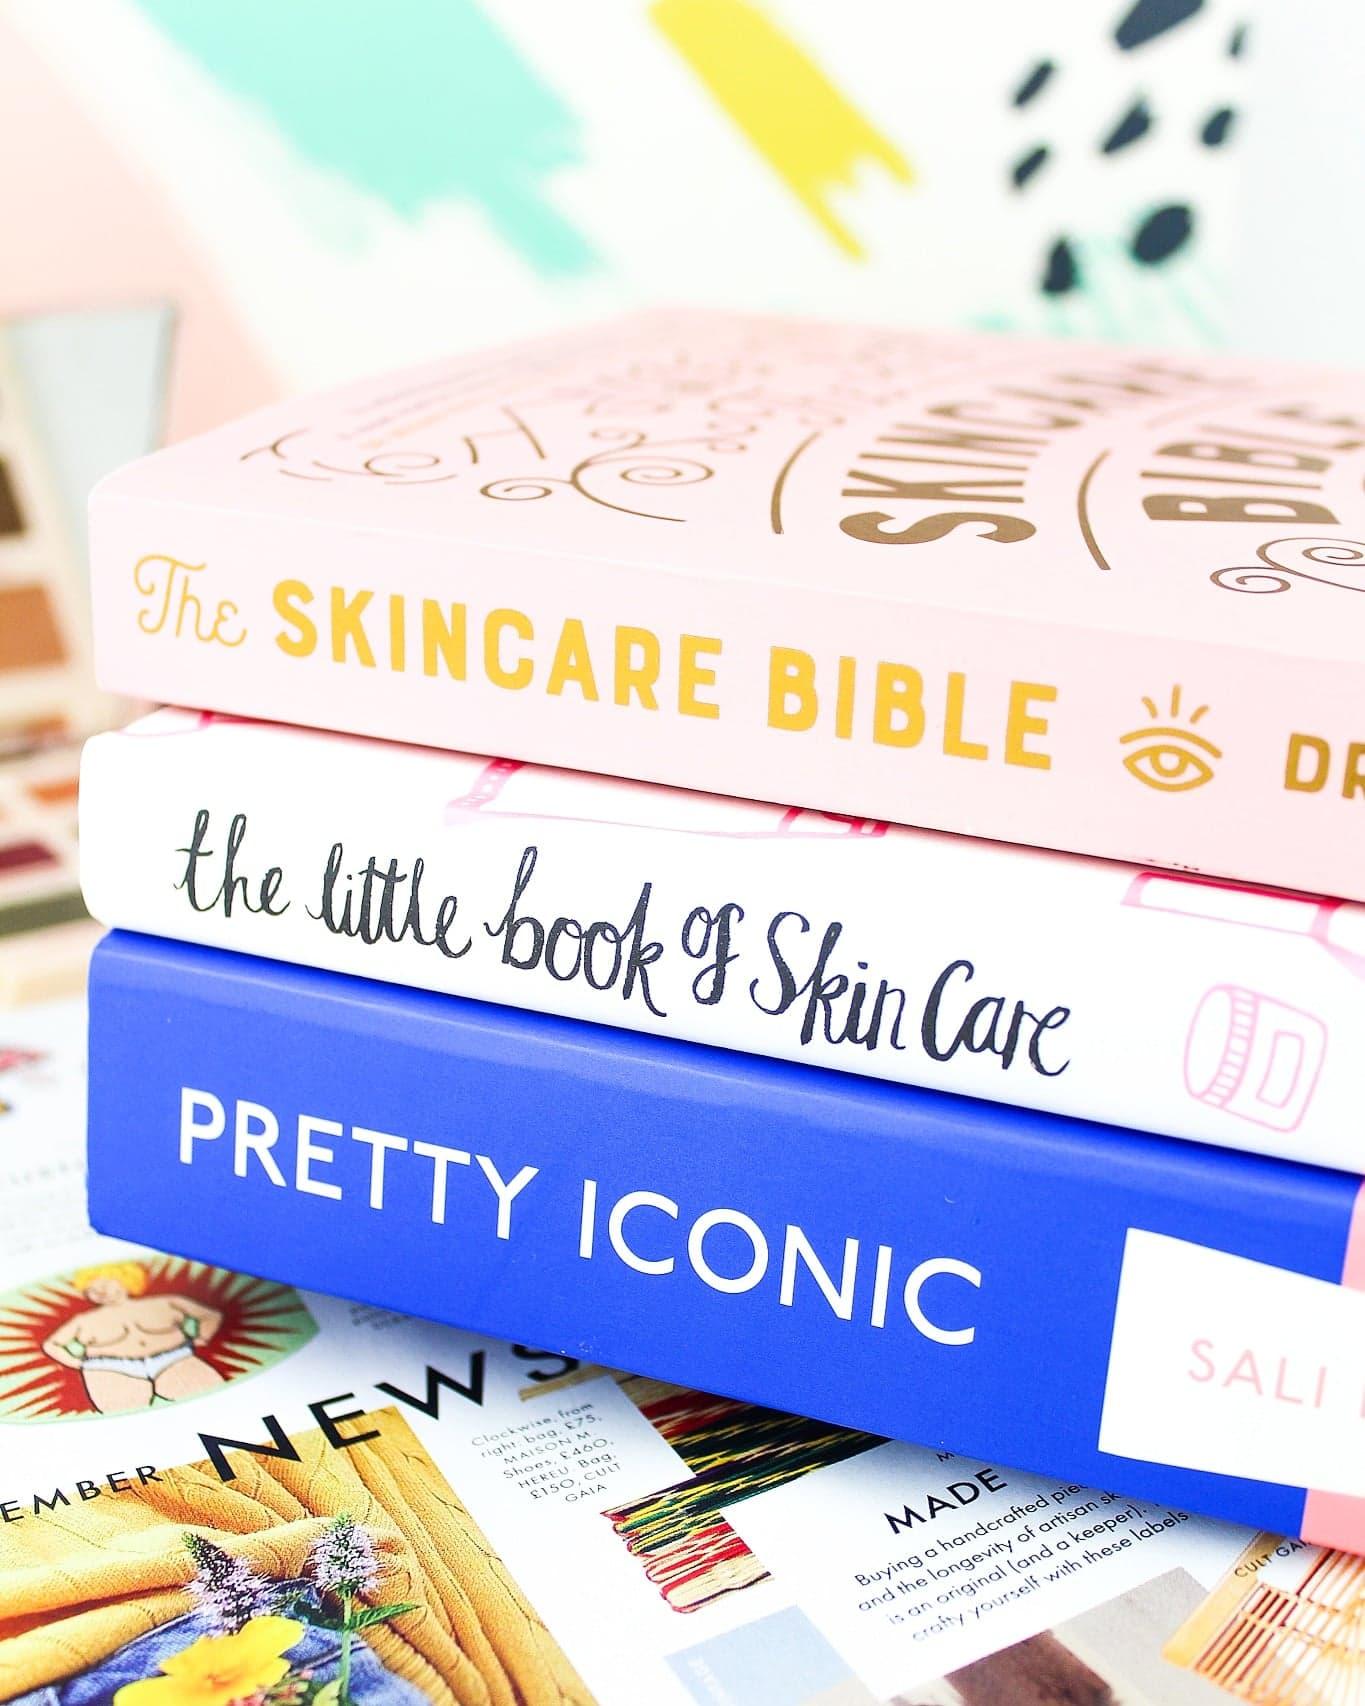 Best Skincare Books & YouTube Channels of 2019 So Far...